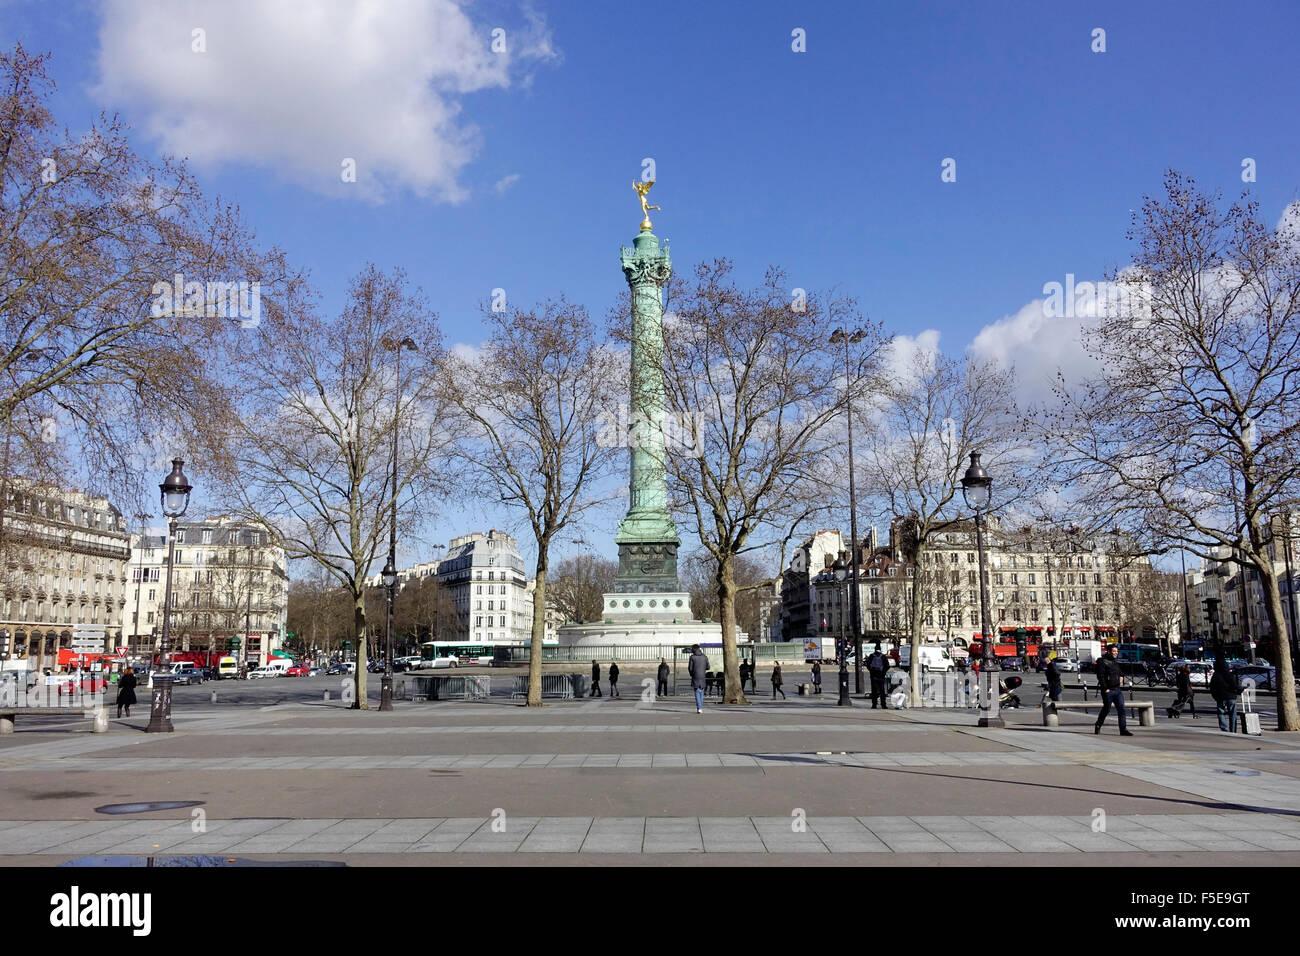 The July Column a monumental column in commemorating the Revolution of 1830 in the Place de la Bastille, Paris, - Stock Image